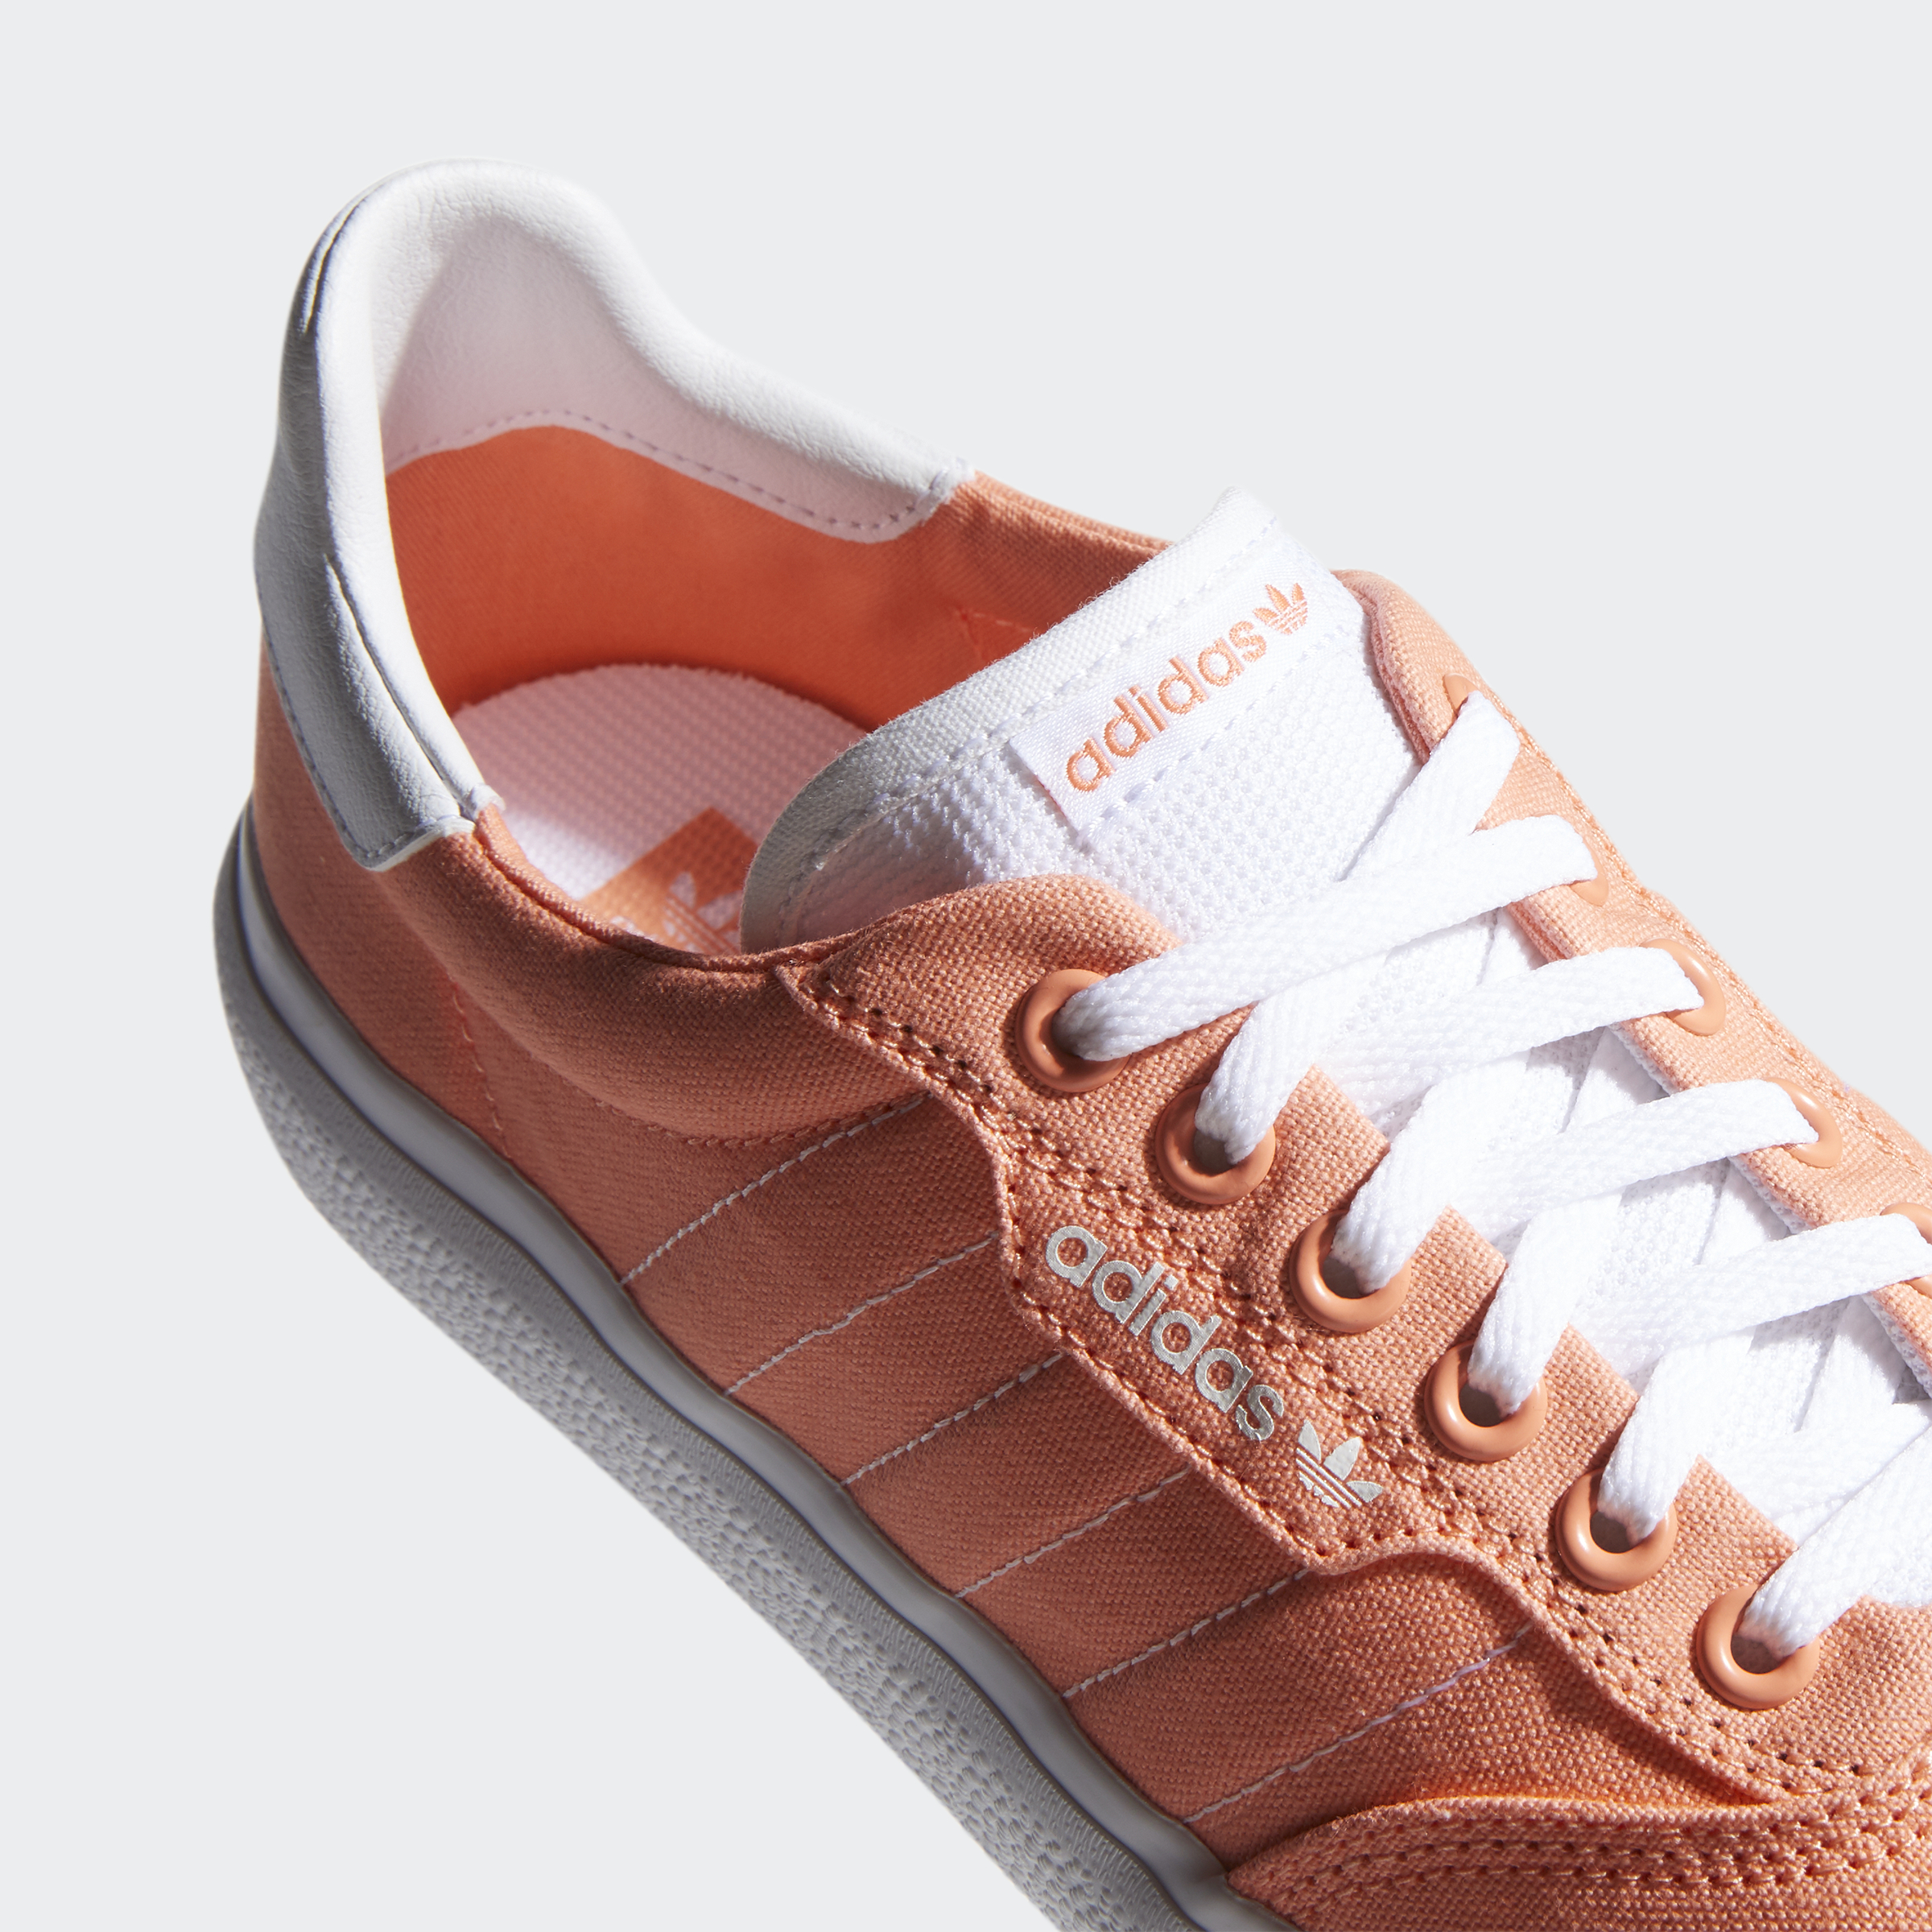 adidas-3MC-Shoes-Athletic-amp-Sneakers thumbnail 26